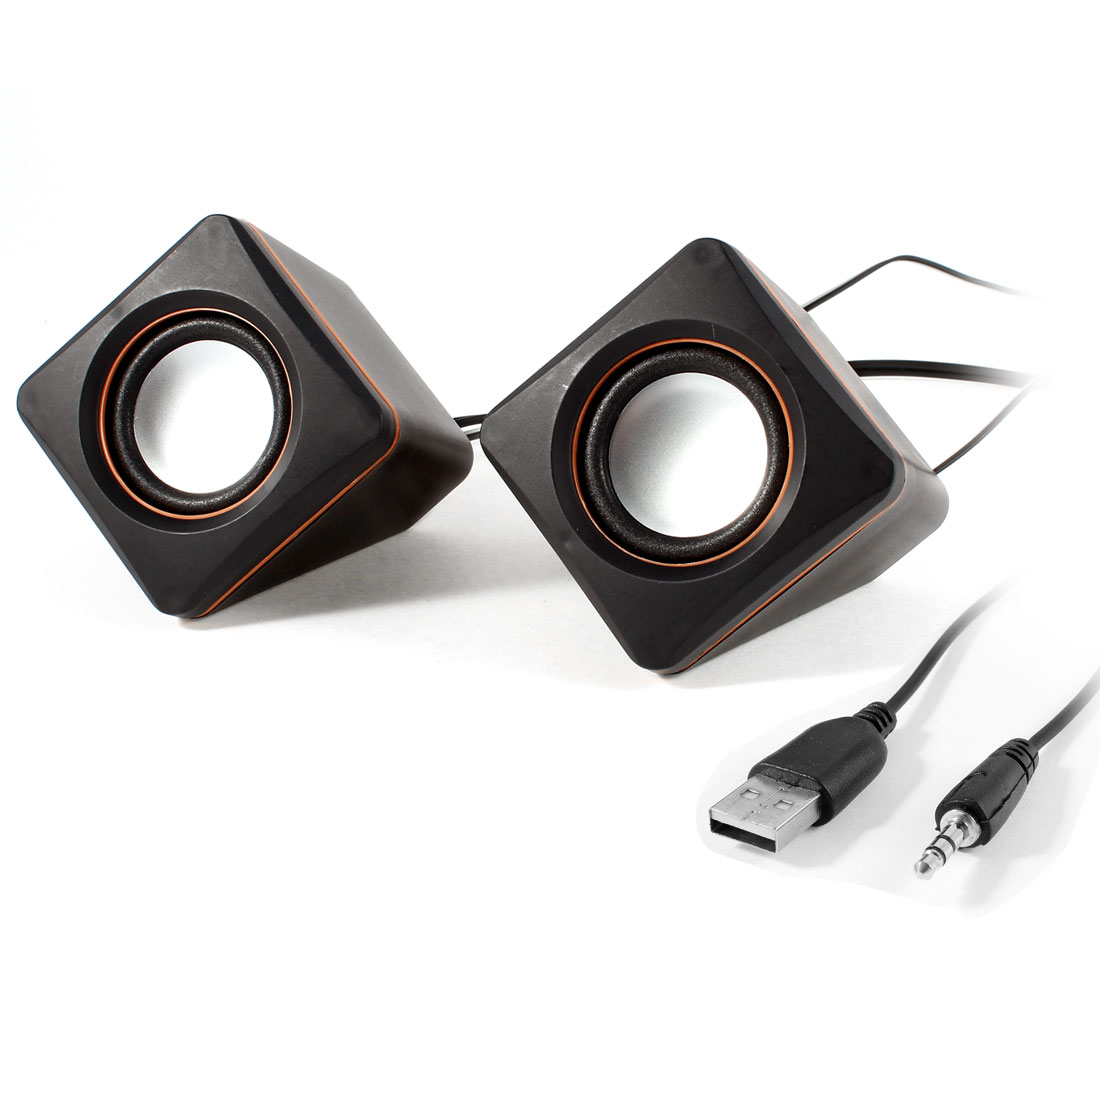 Black Volume Control USB 2.0 Desktop Mini Digital Speaker Box Pair for Pc Computer